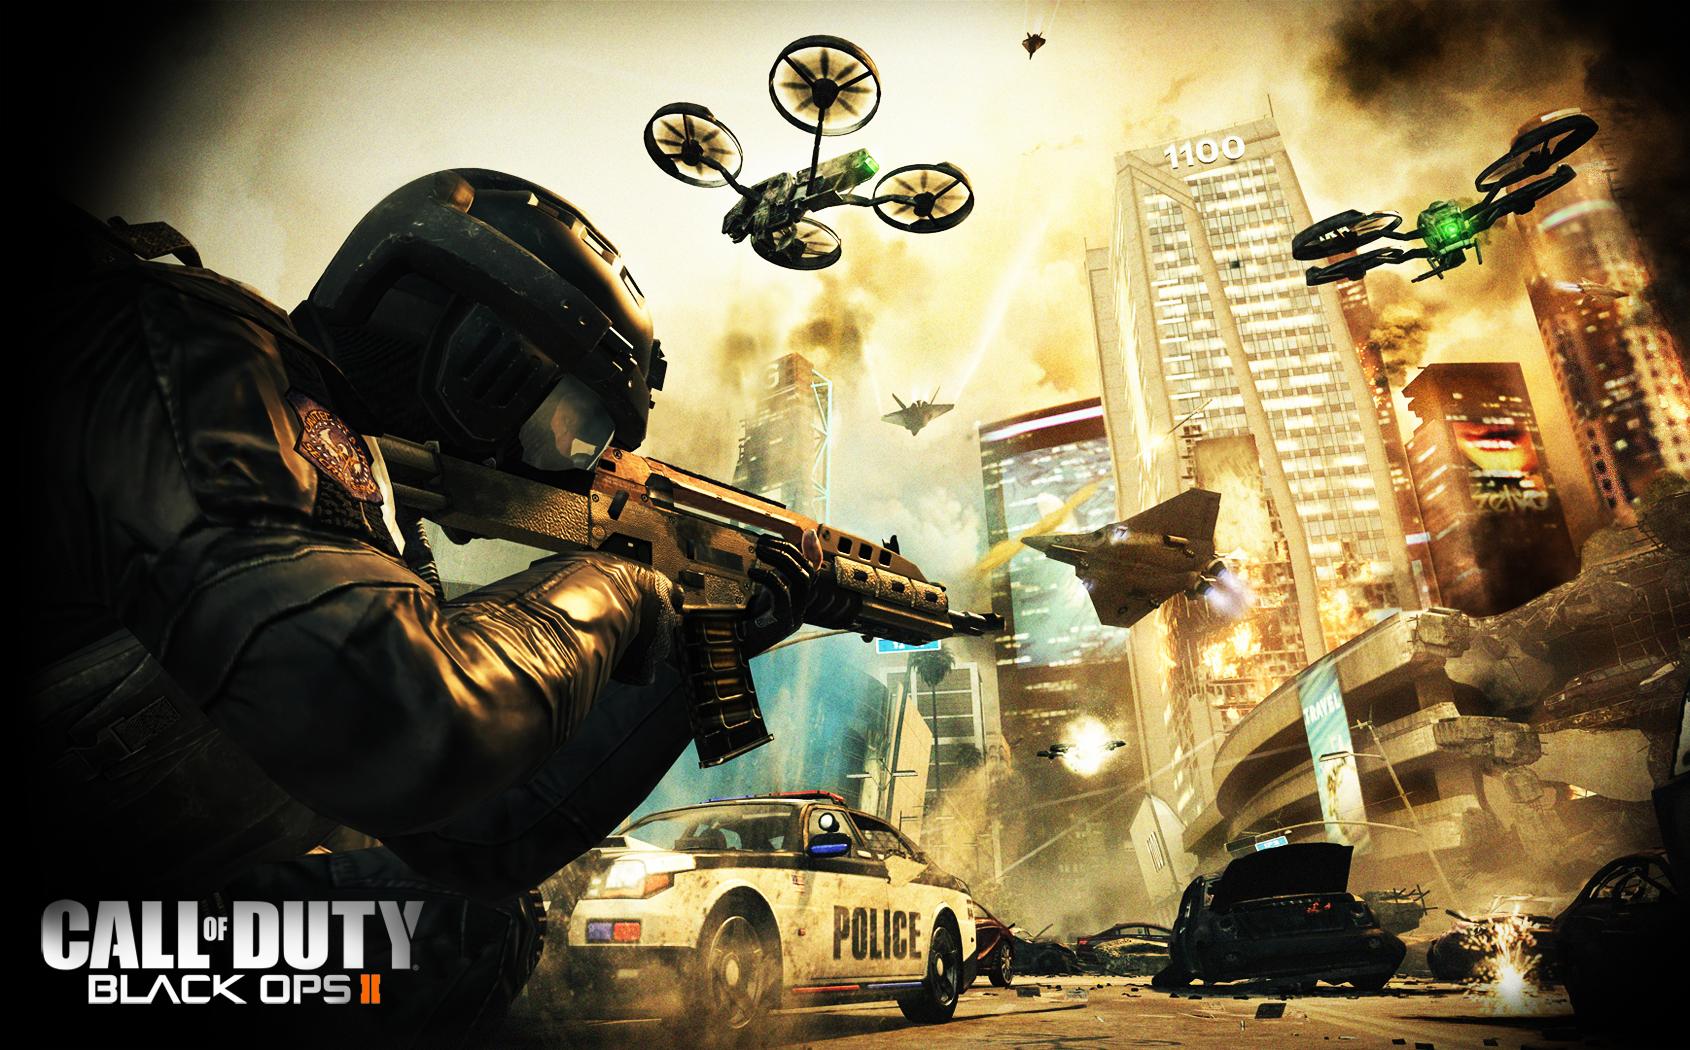 Free Download Wallpaper Call Of Duty Black Ops 2 Hd Taringa